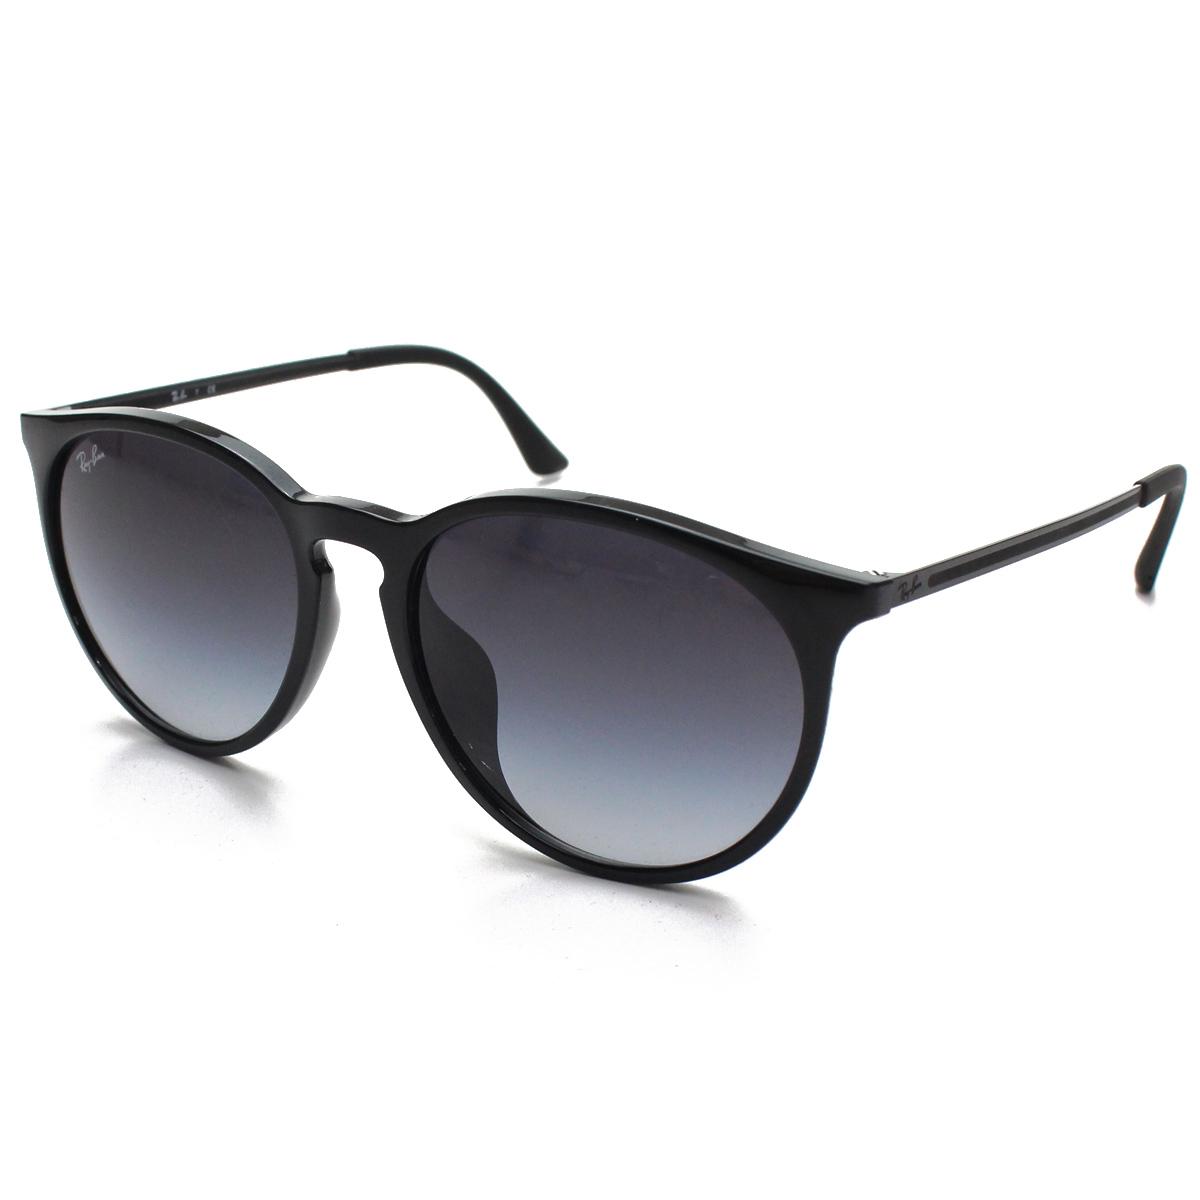 95bc7270287 Bighit The total brand wholesale  Ray-Ban Ray-Ban sunglasses ERIKA Erika  RB4274F 601 8G(57) black